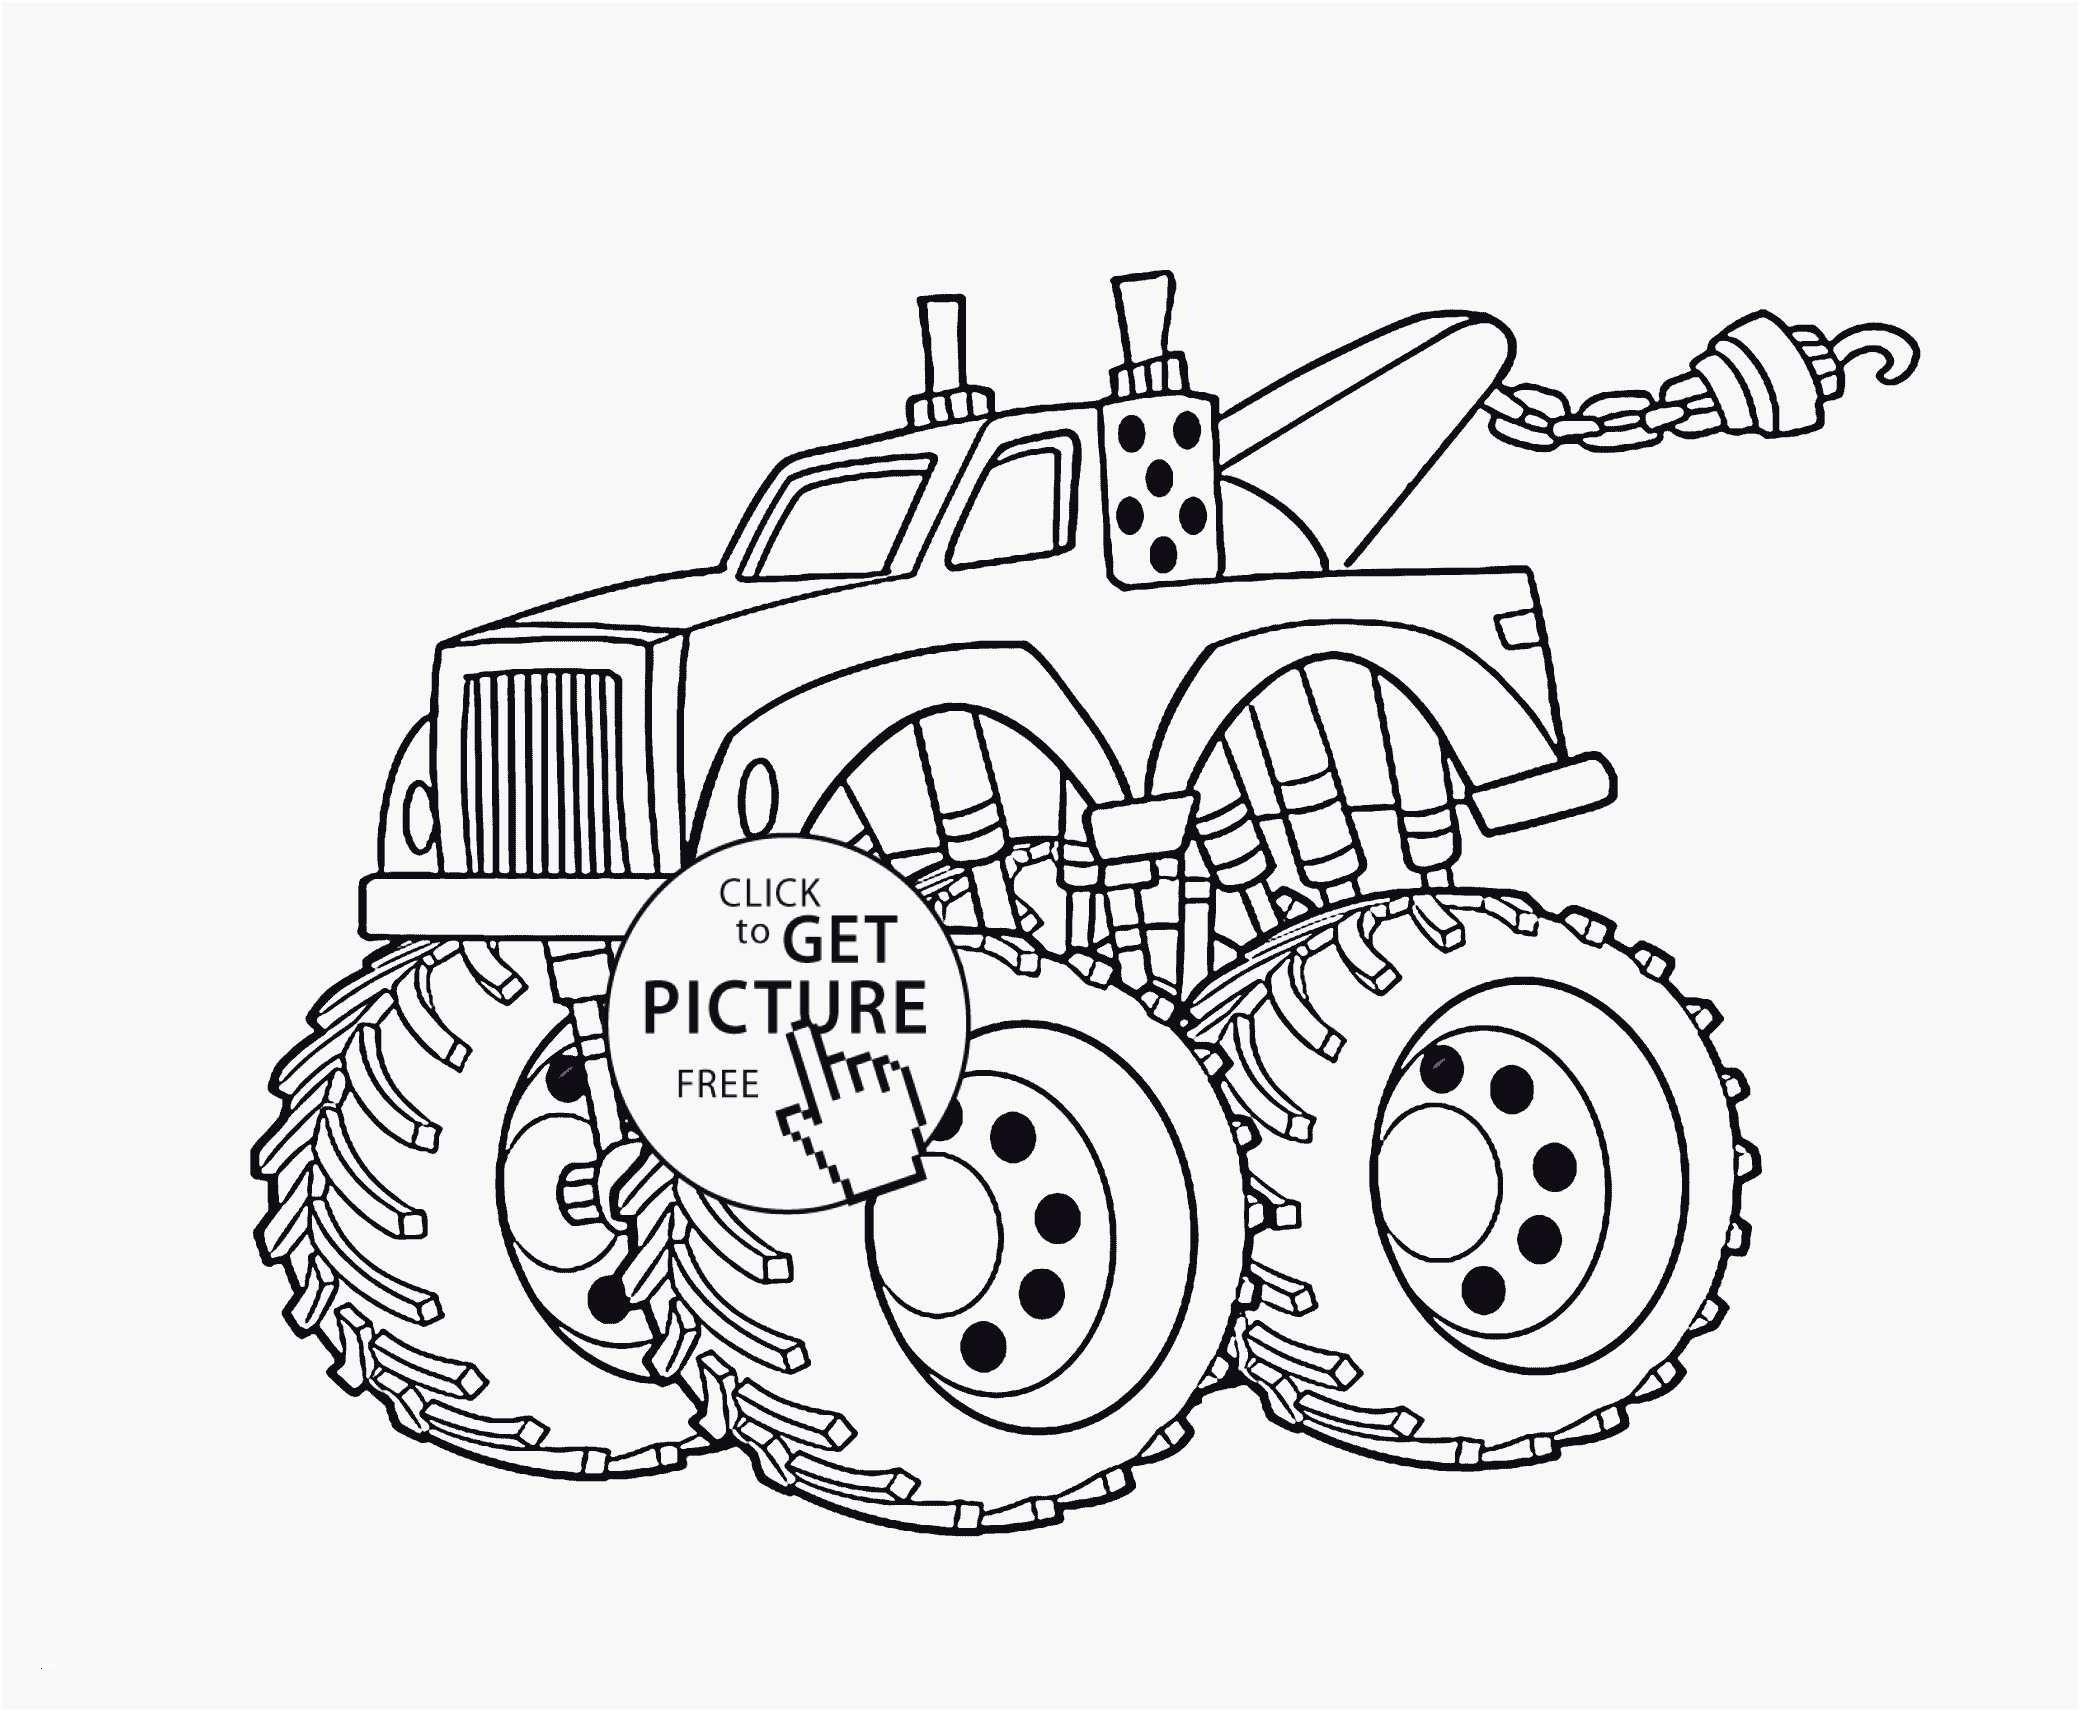 playmobil ausmalbilder feuerwehr : playmobil